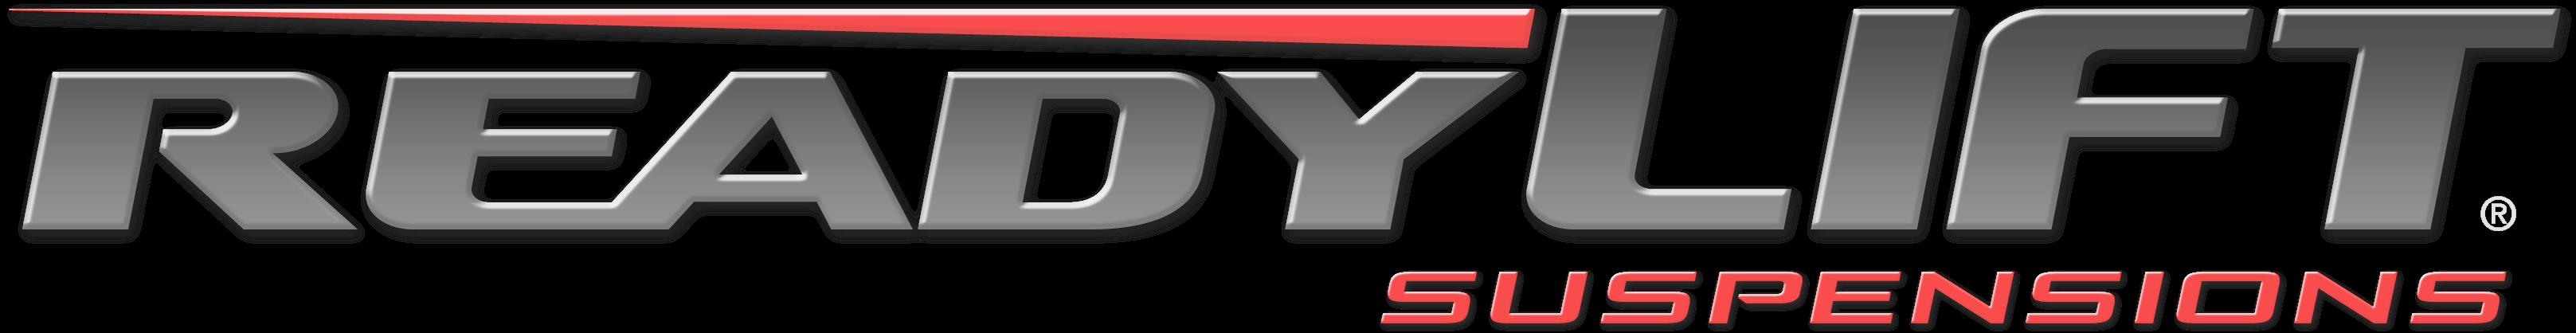 ReadyLift Suspension Logo